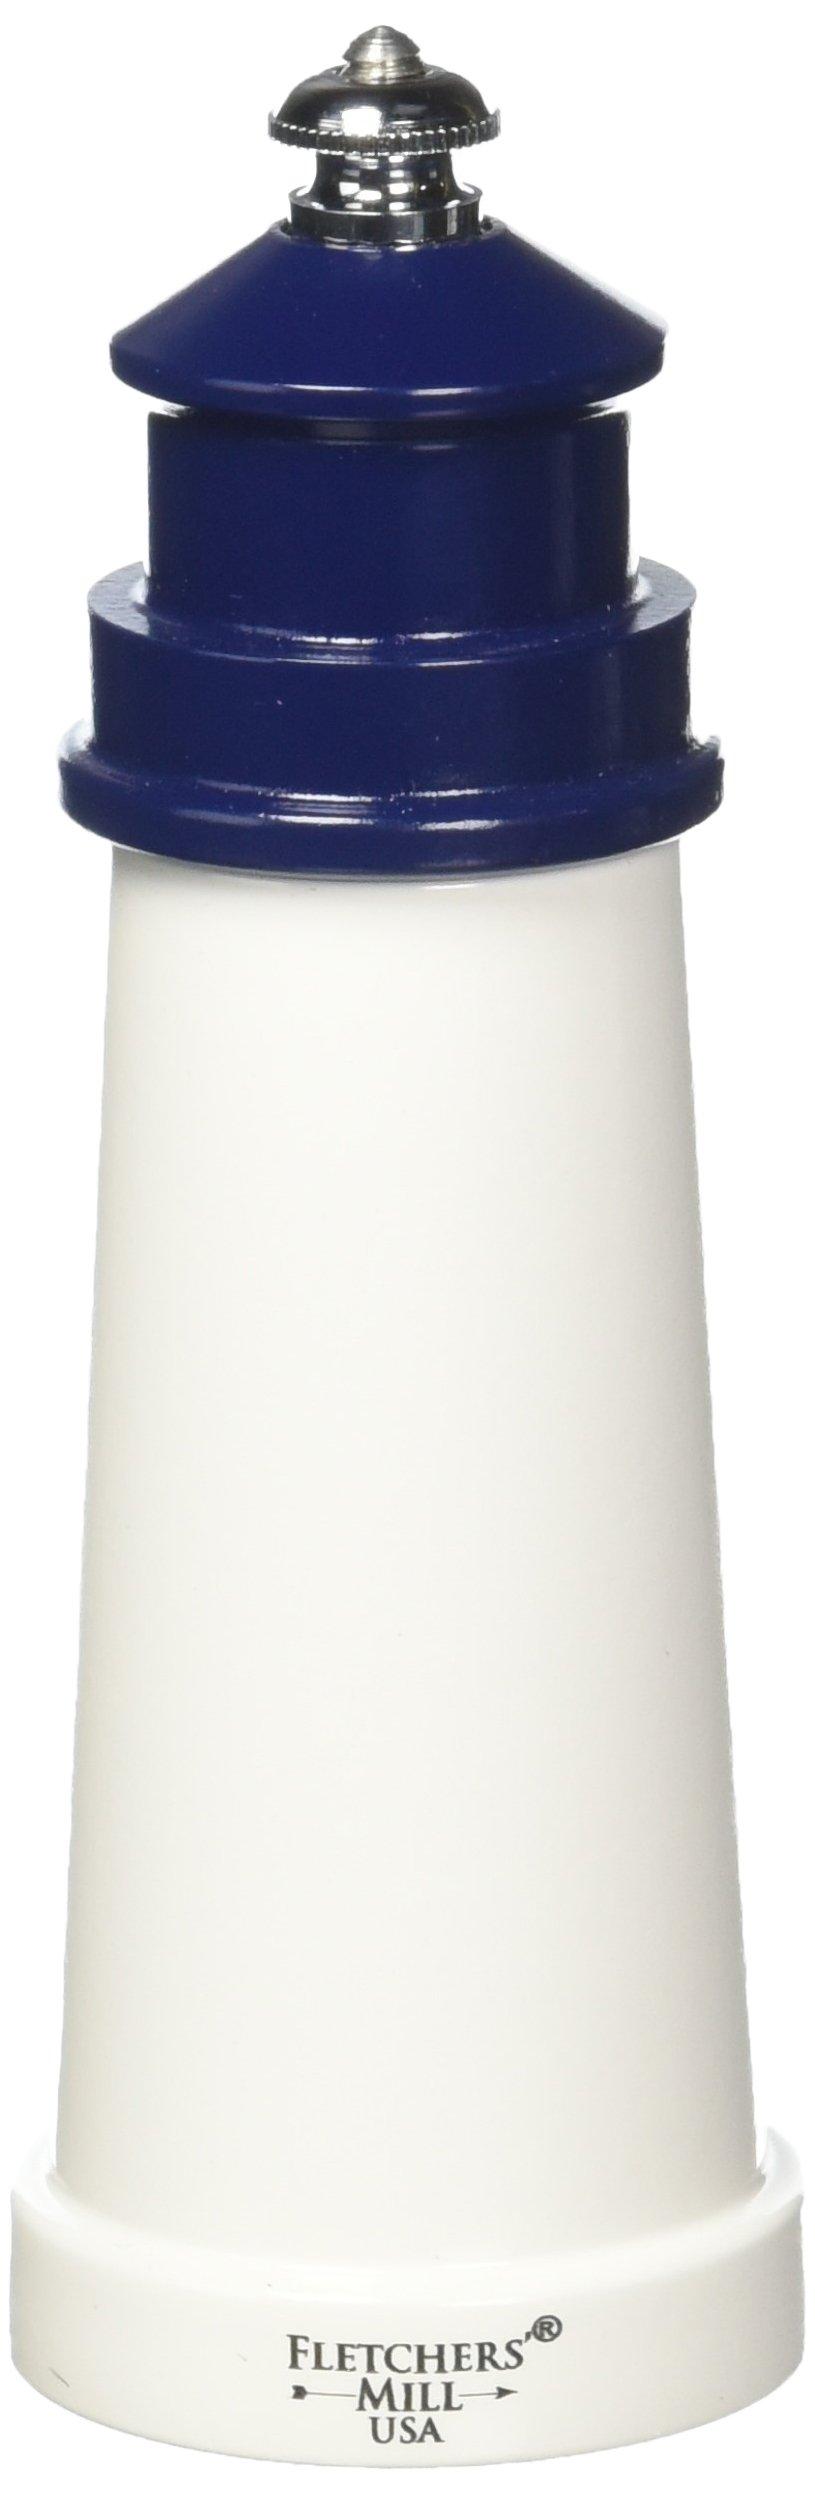 Fletchers' Mill Lighthouse Pepper Mill, White/Cobalt - 6 Inch